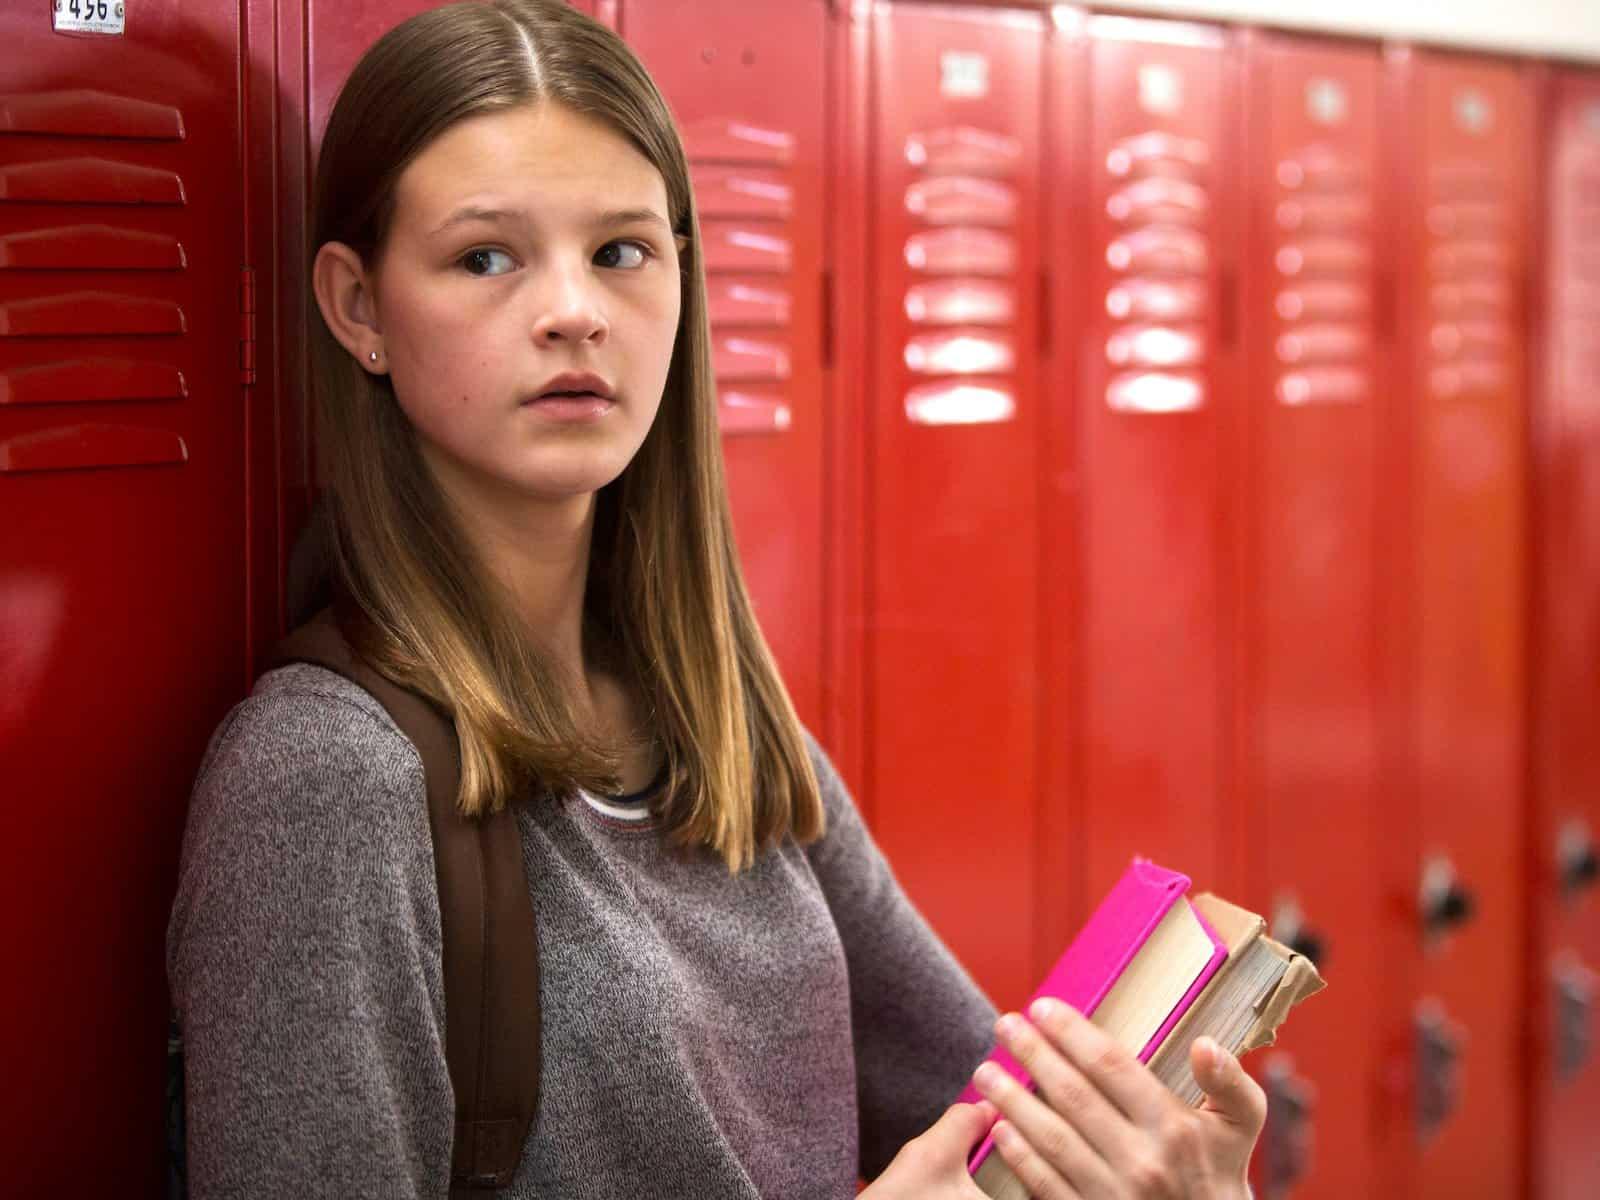 Kate Messner Everything Sucks Netflix , Hay una lesbiana en mi sopa